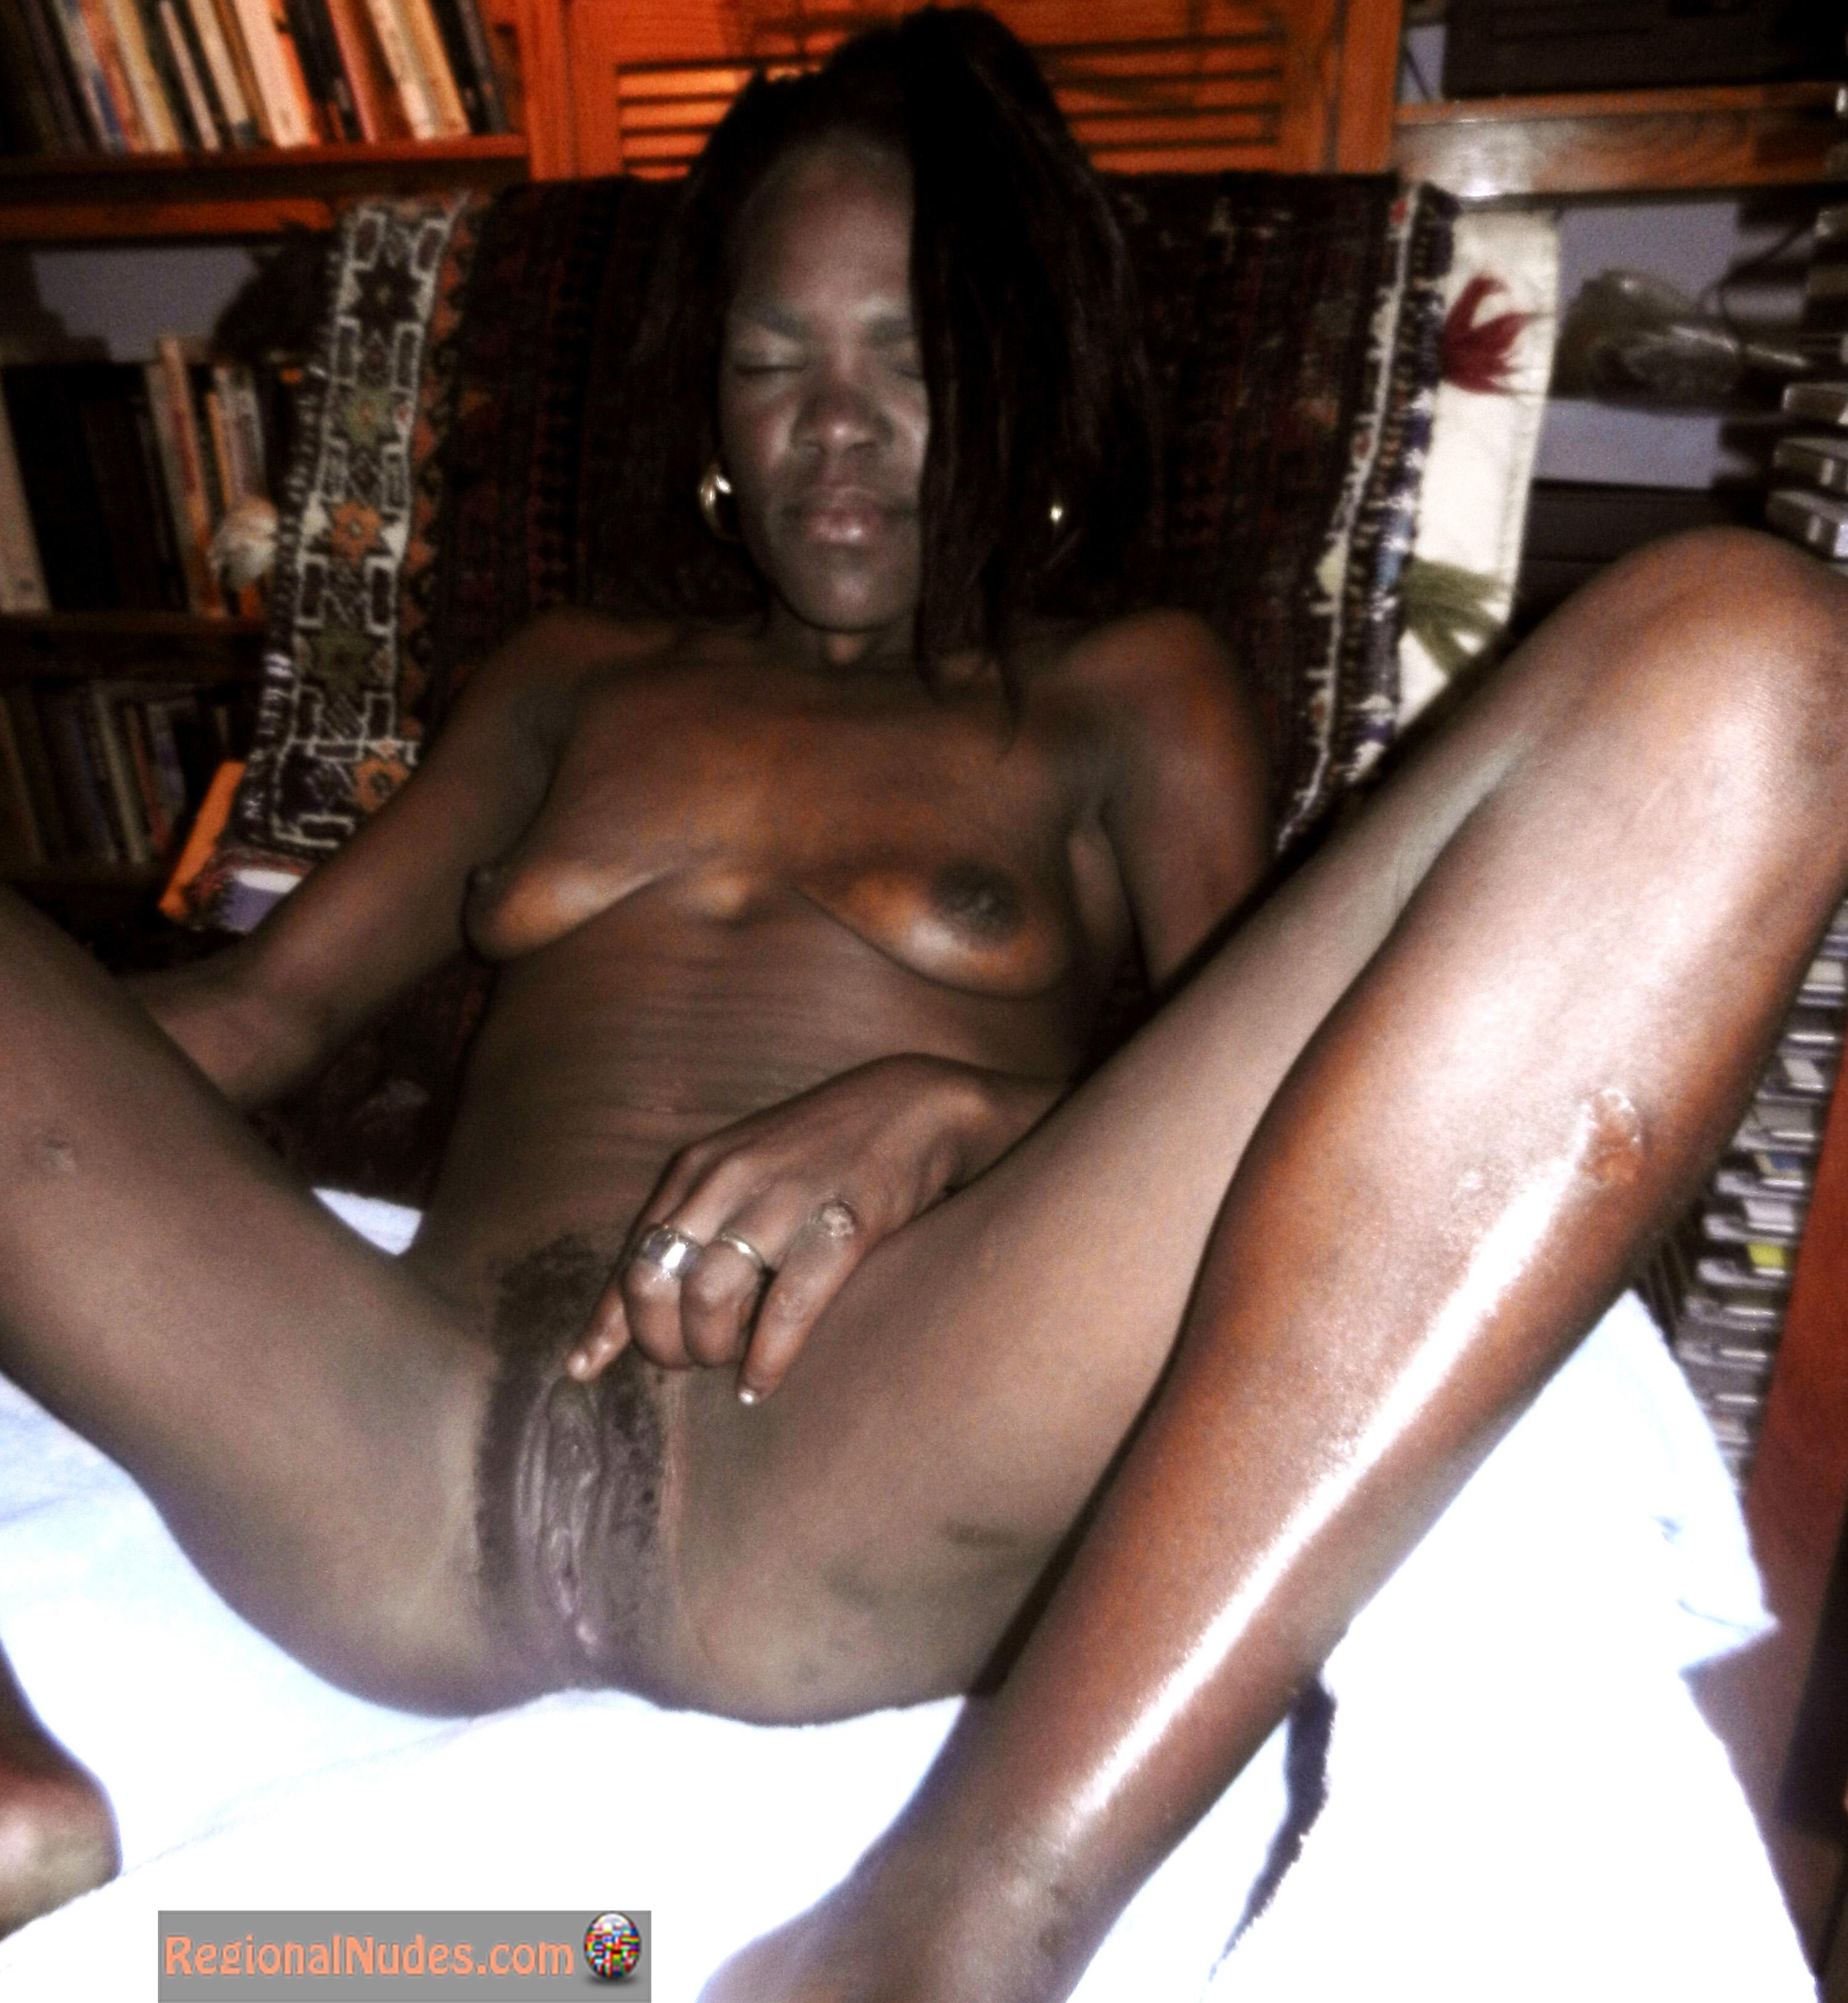 Souht afrcia girls naked pusy pics